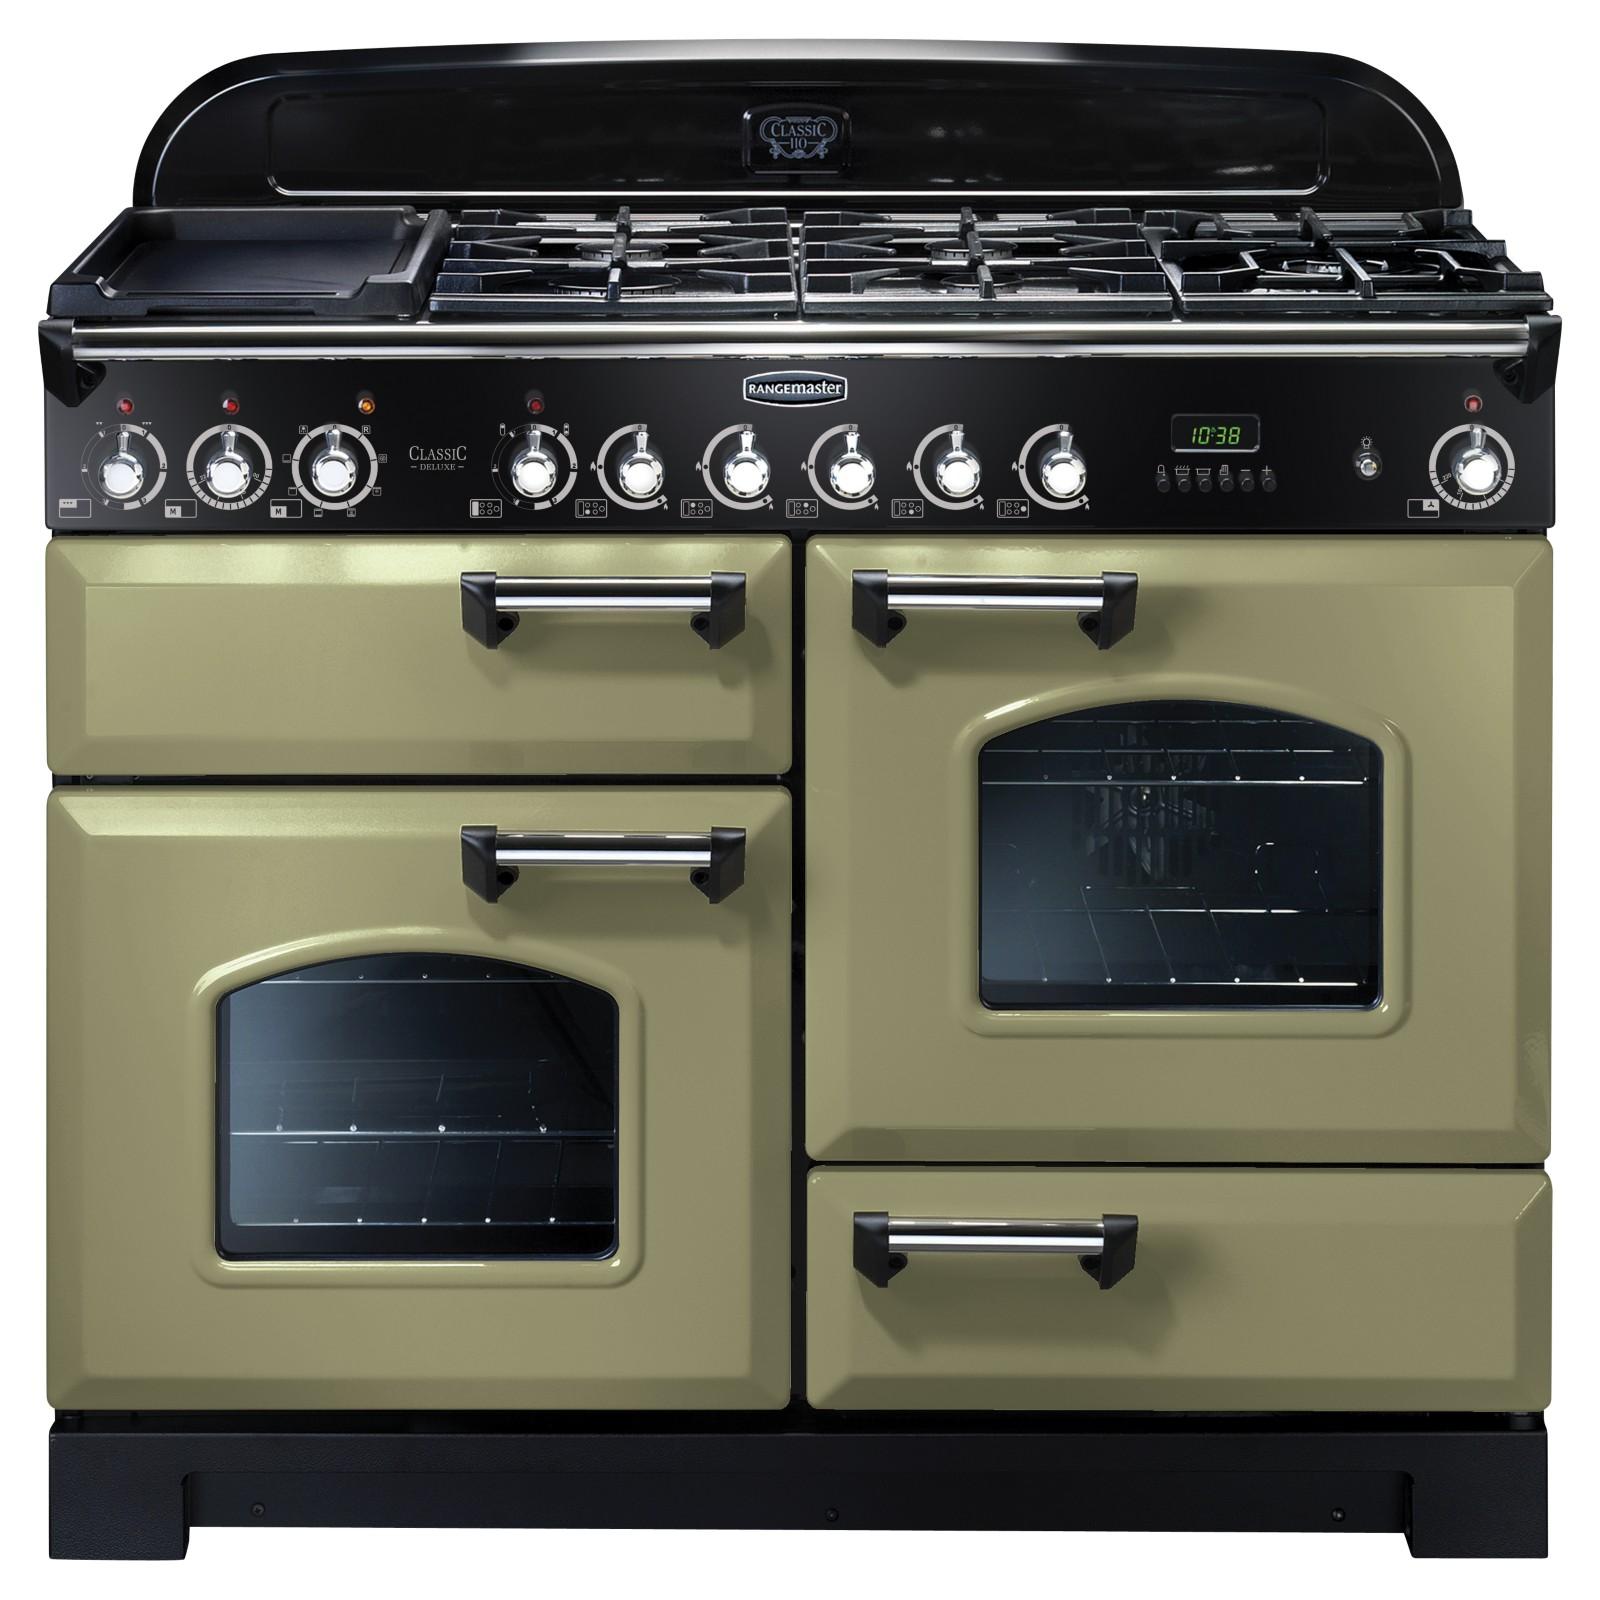 rangemaster classic deluxe 110 dual fuel range cooker. Black Bedroom Furniture Sets. Home Design Ideas